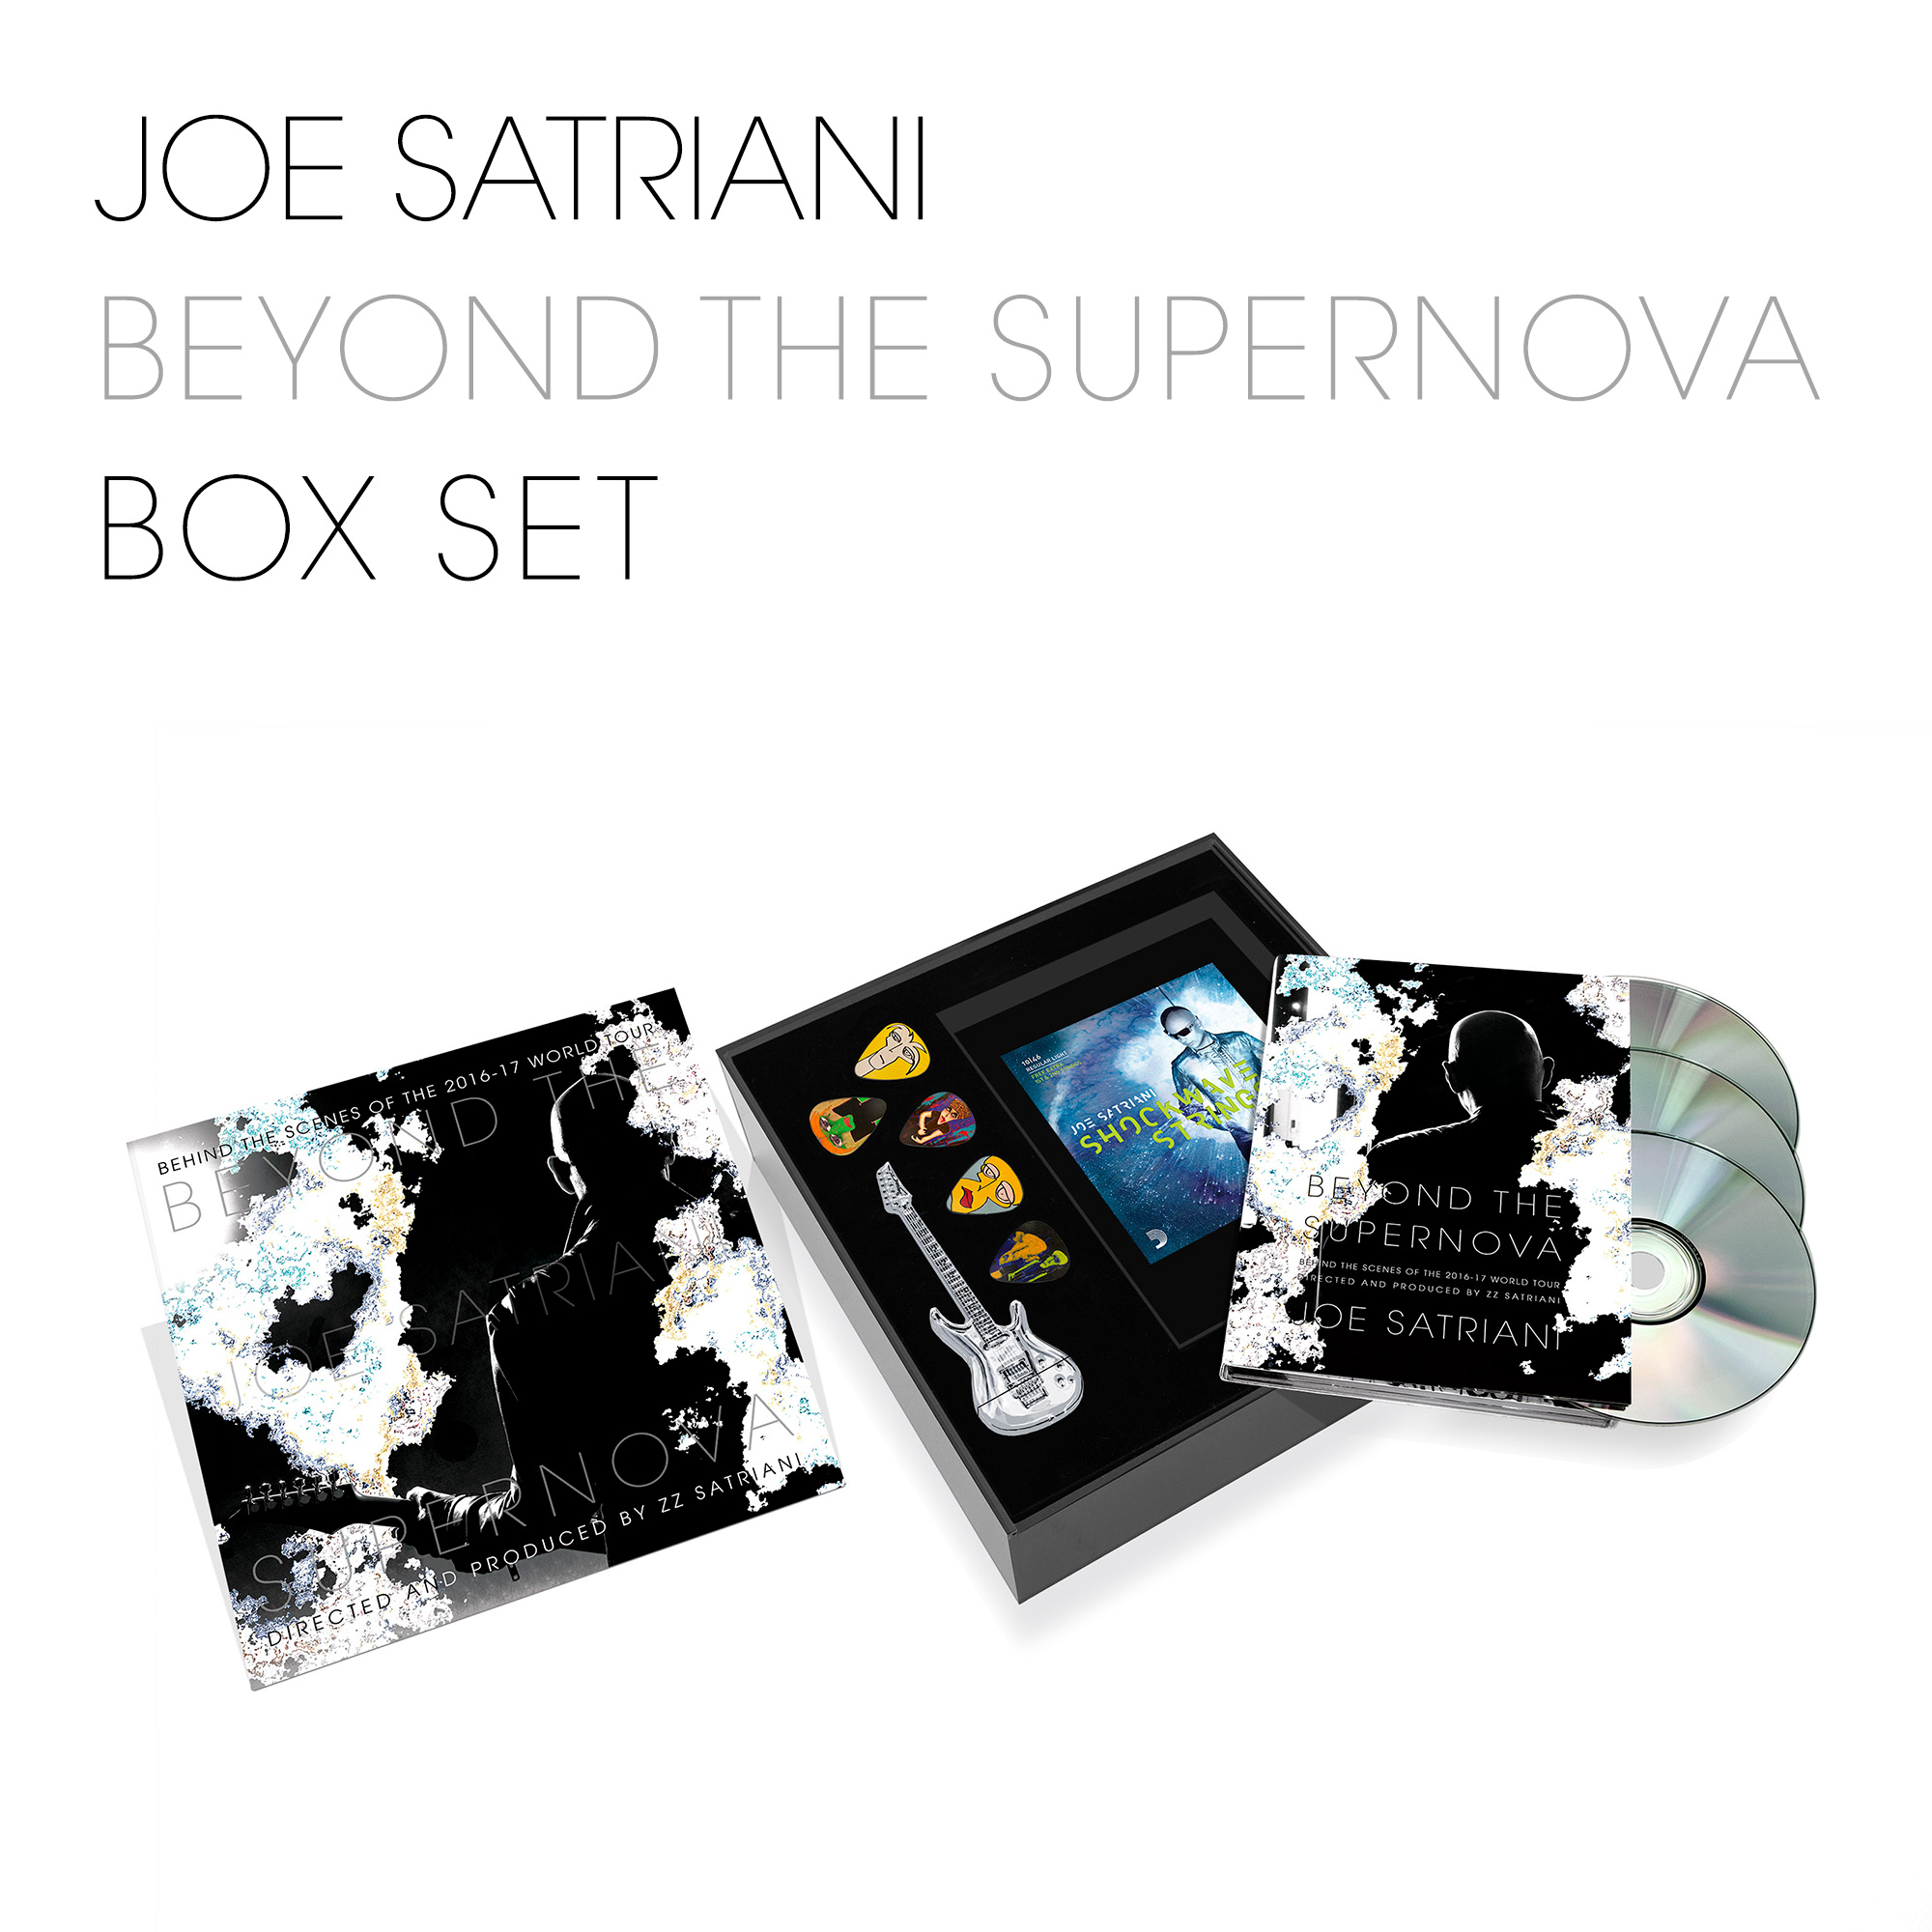 Joe Satriani - discography > discography listing